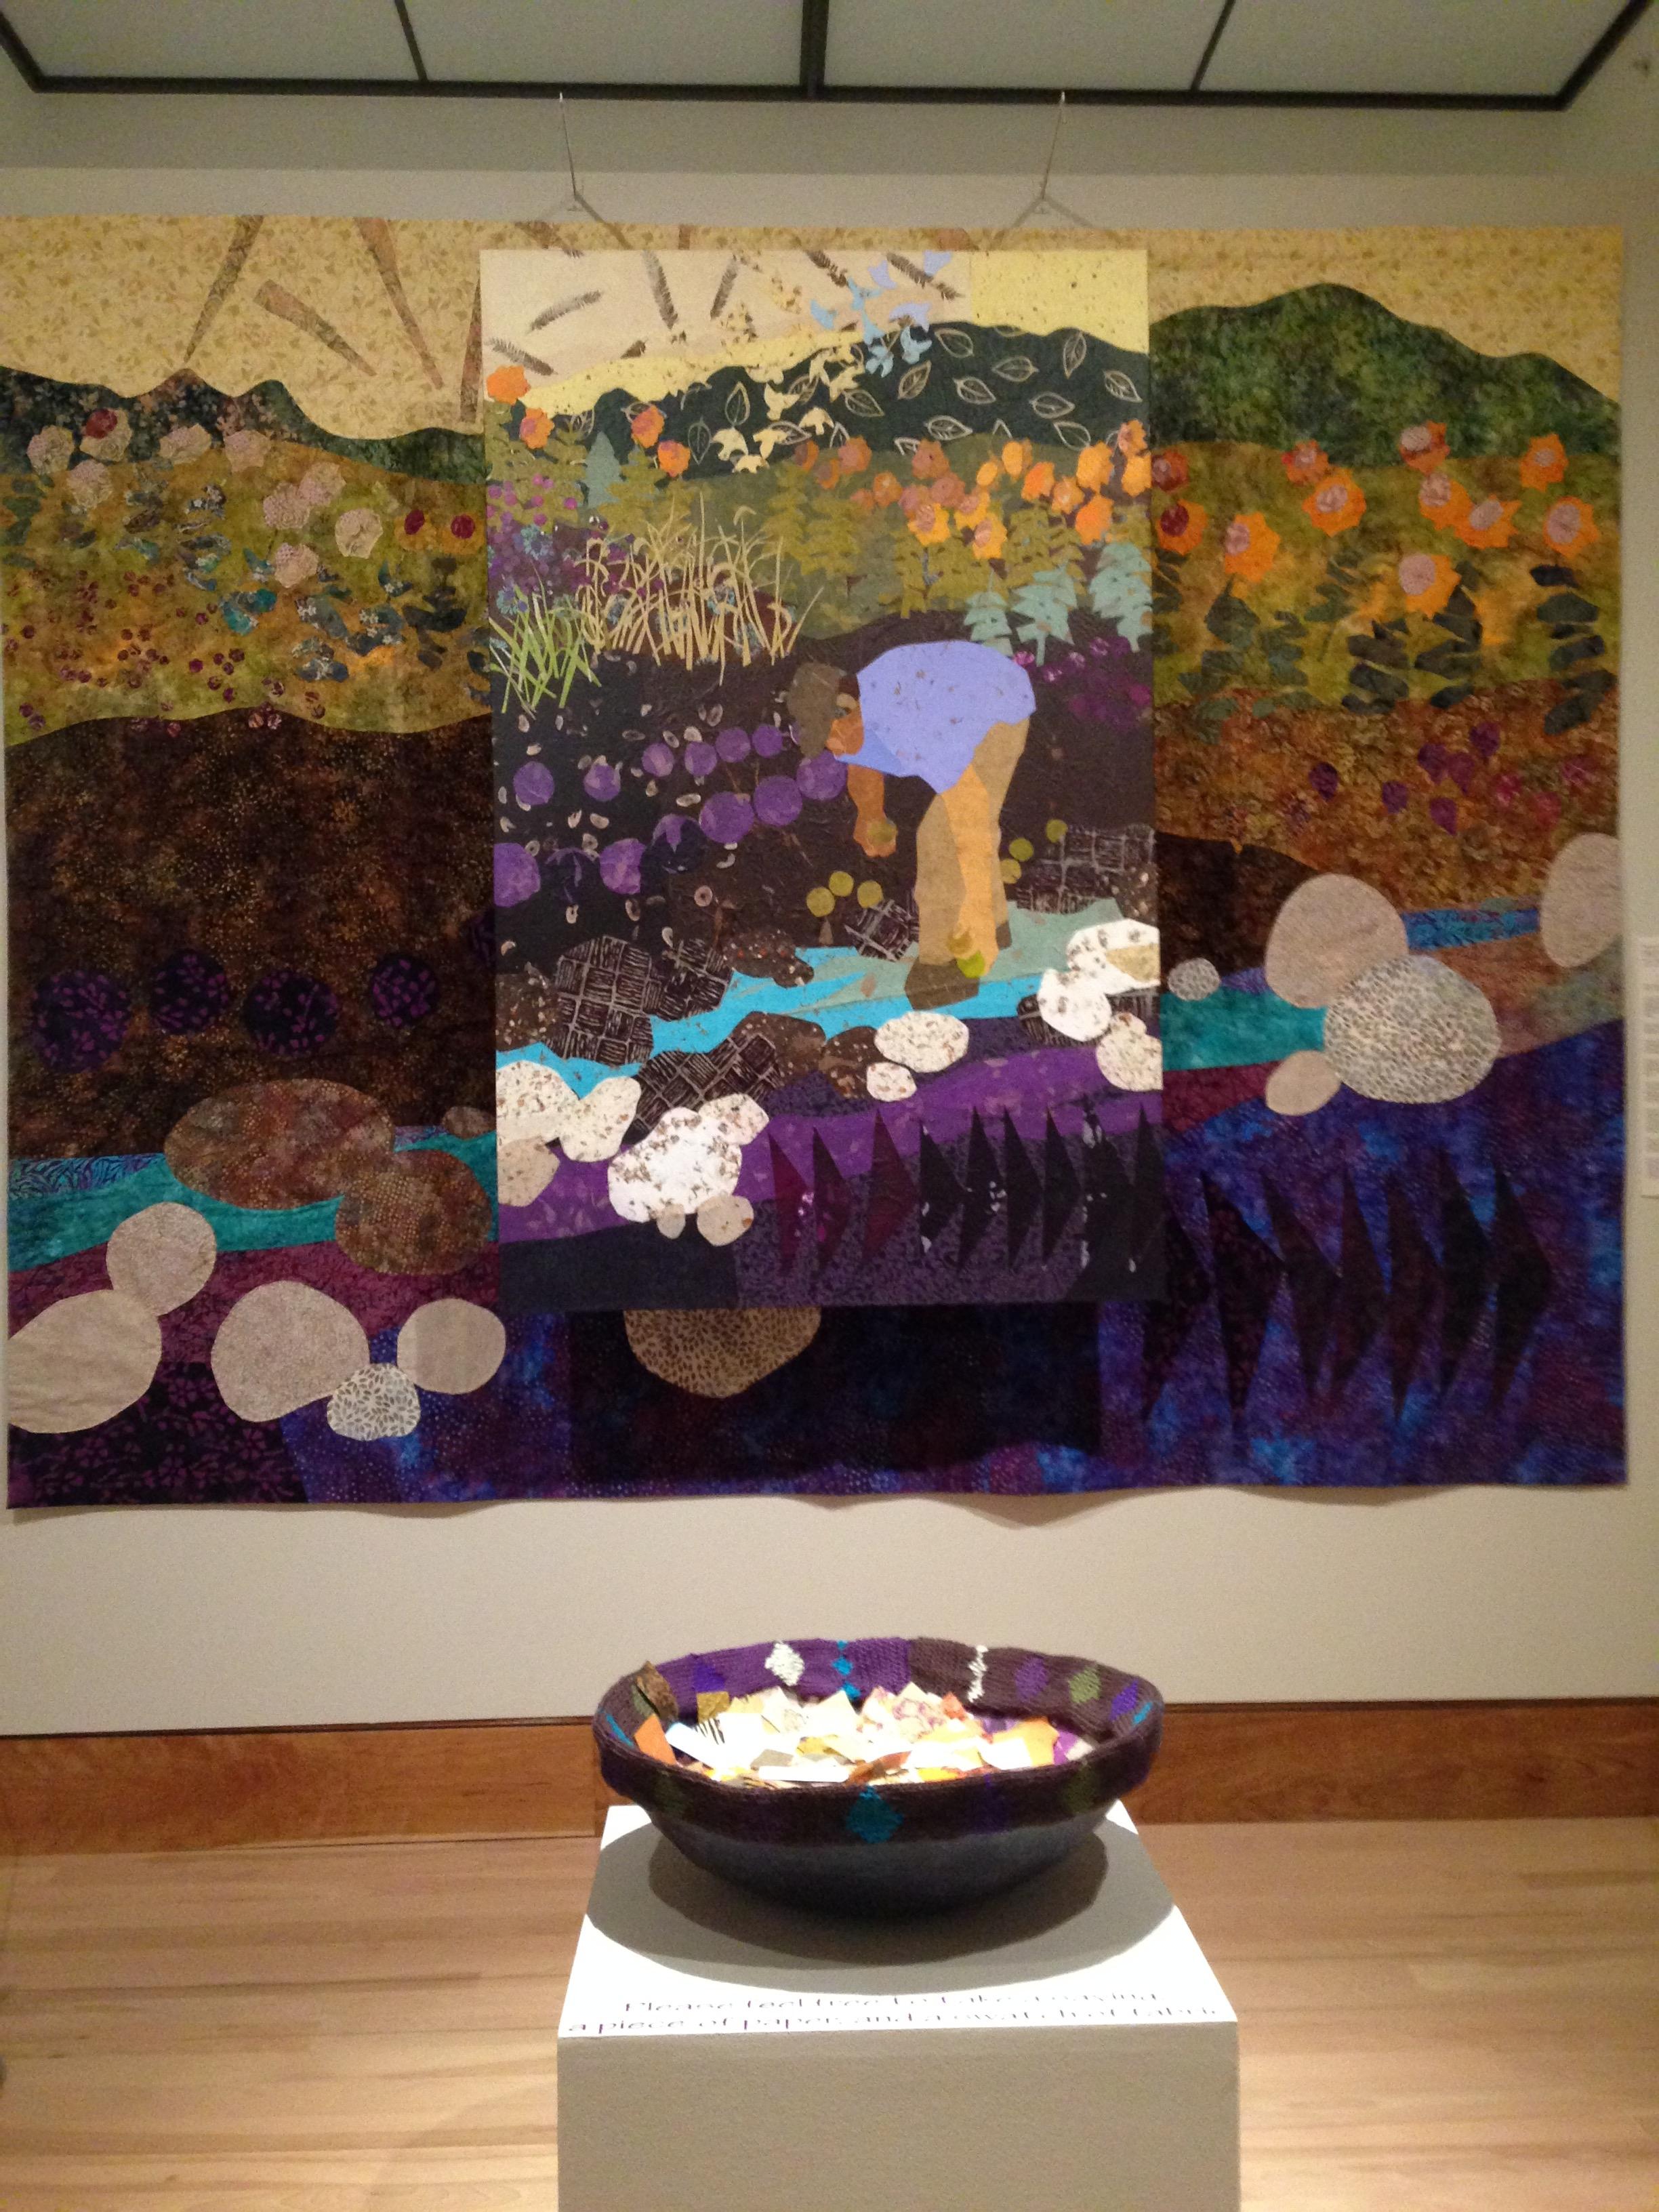 Bonnie-Acker-installation-shelburne-museum